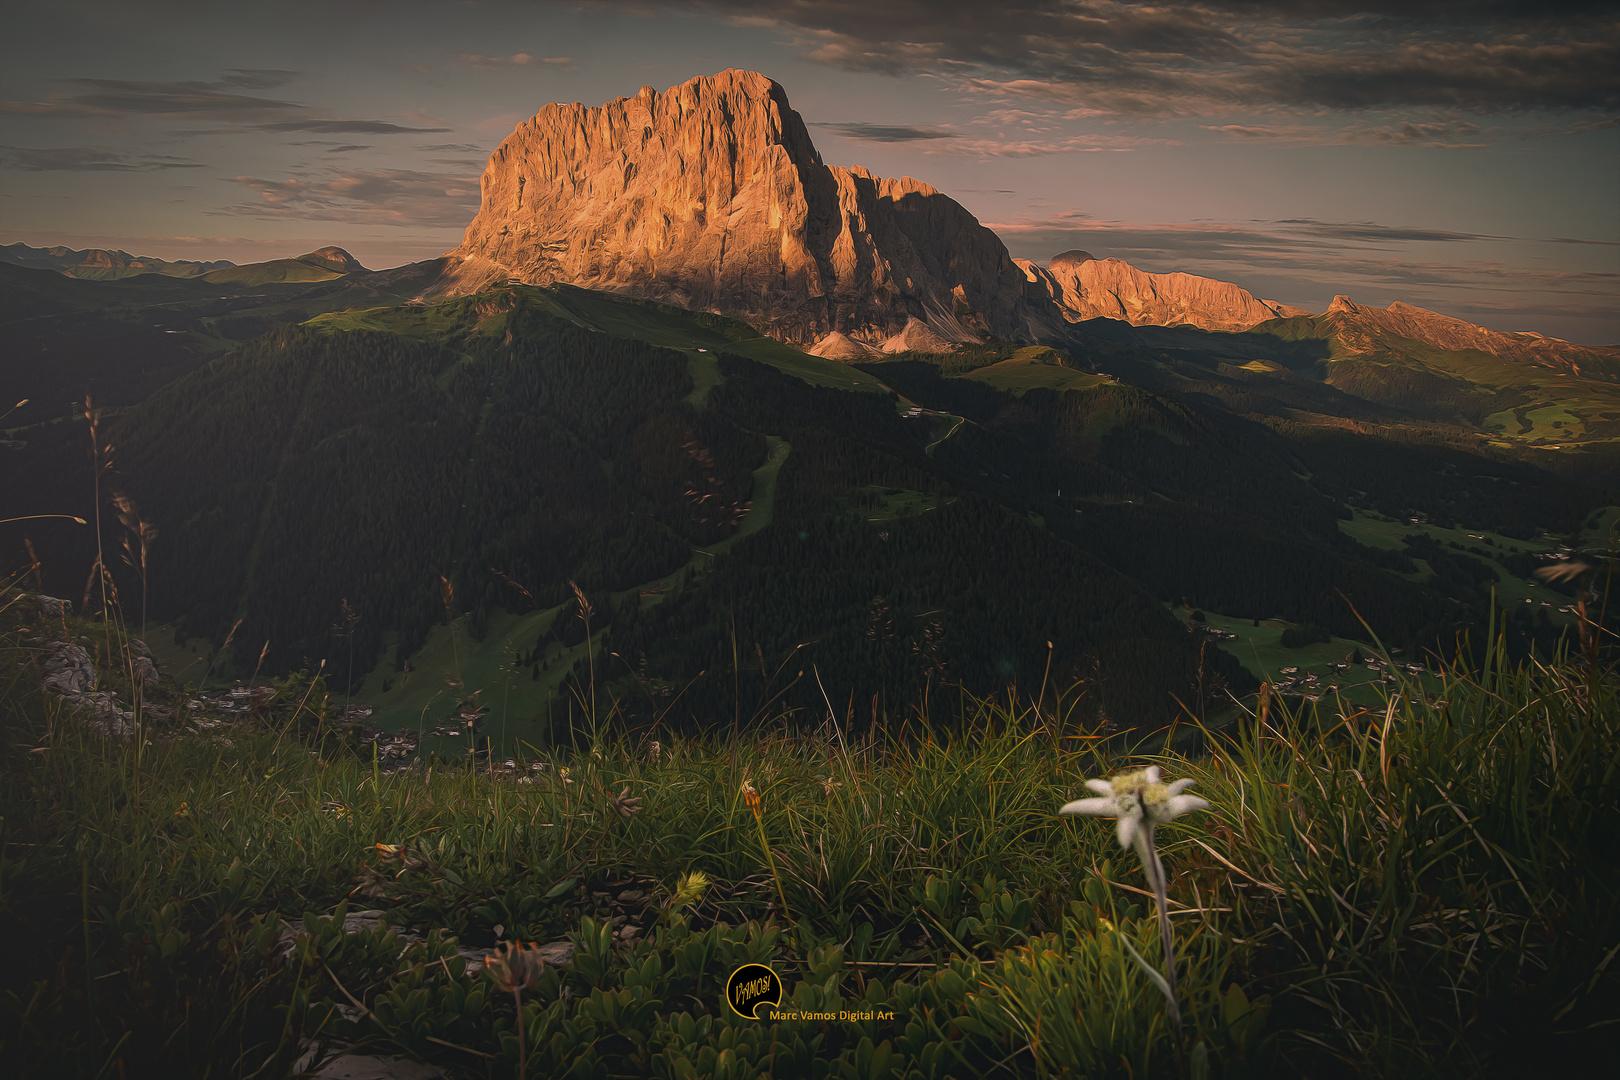 Vom Berg, da grüßt ein Edelweiß